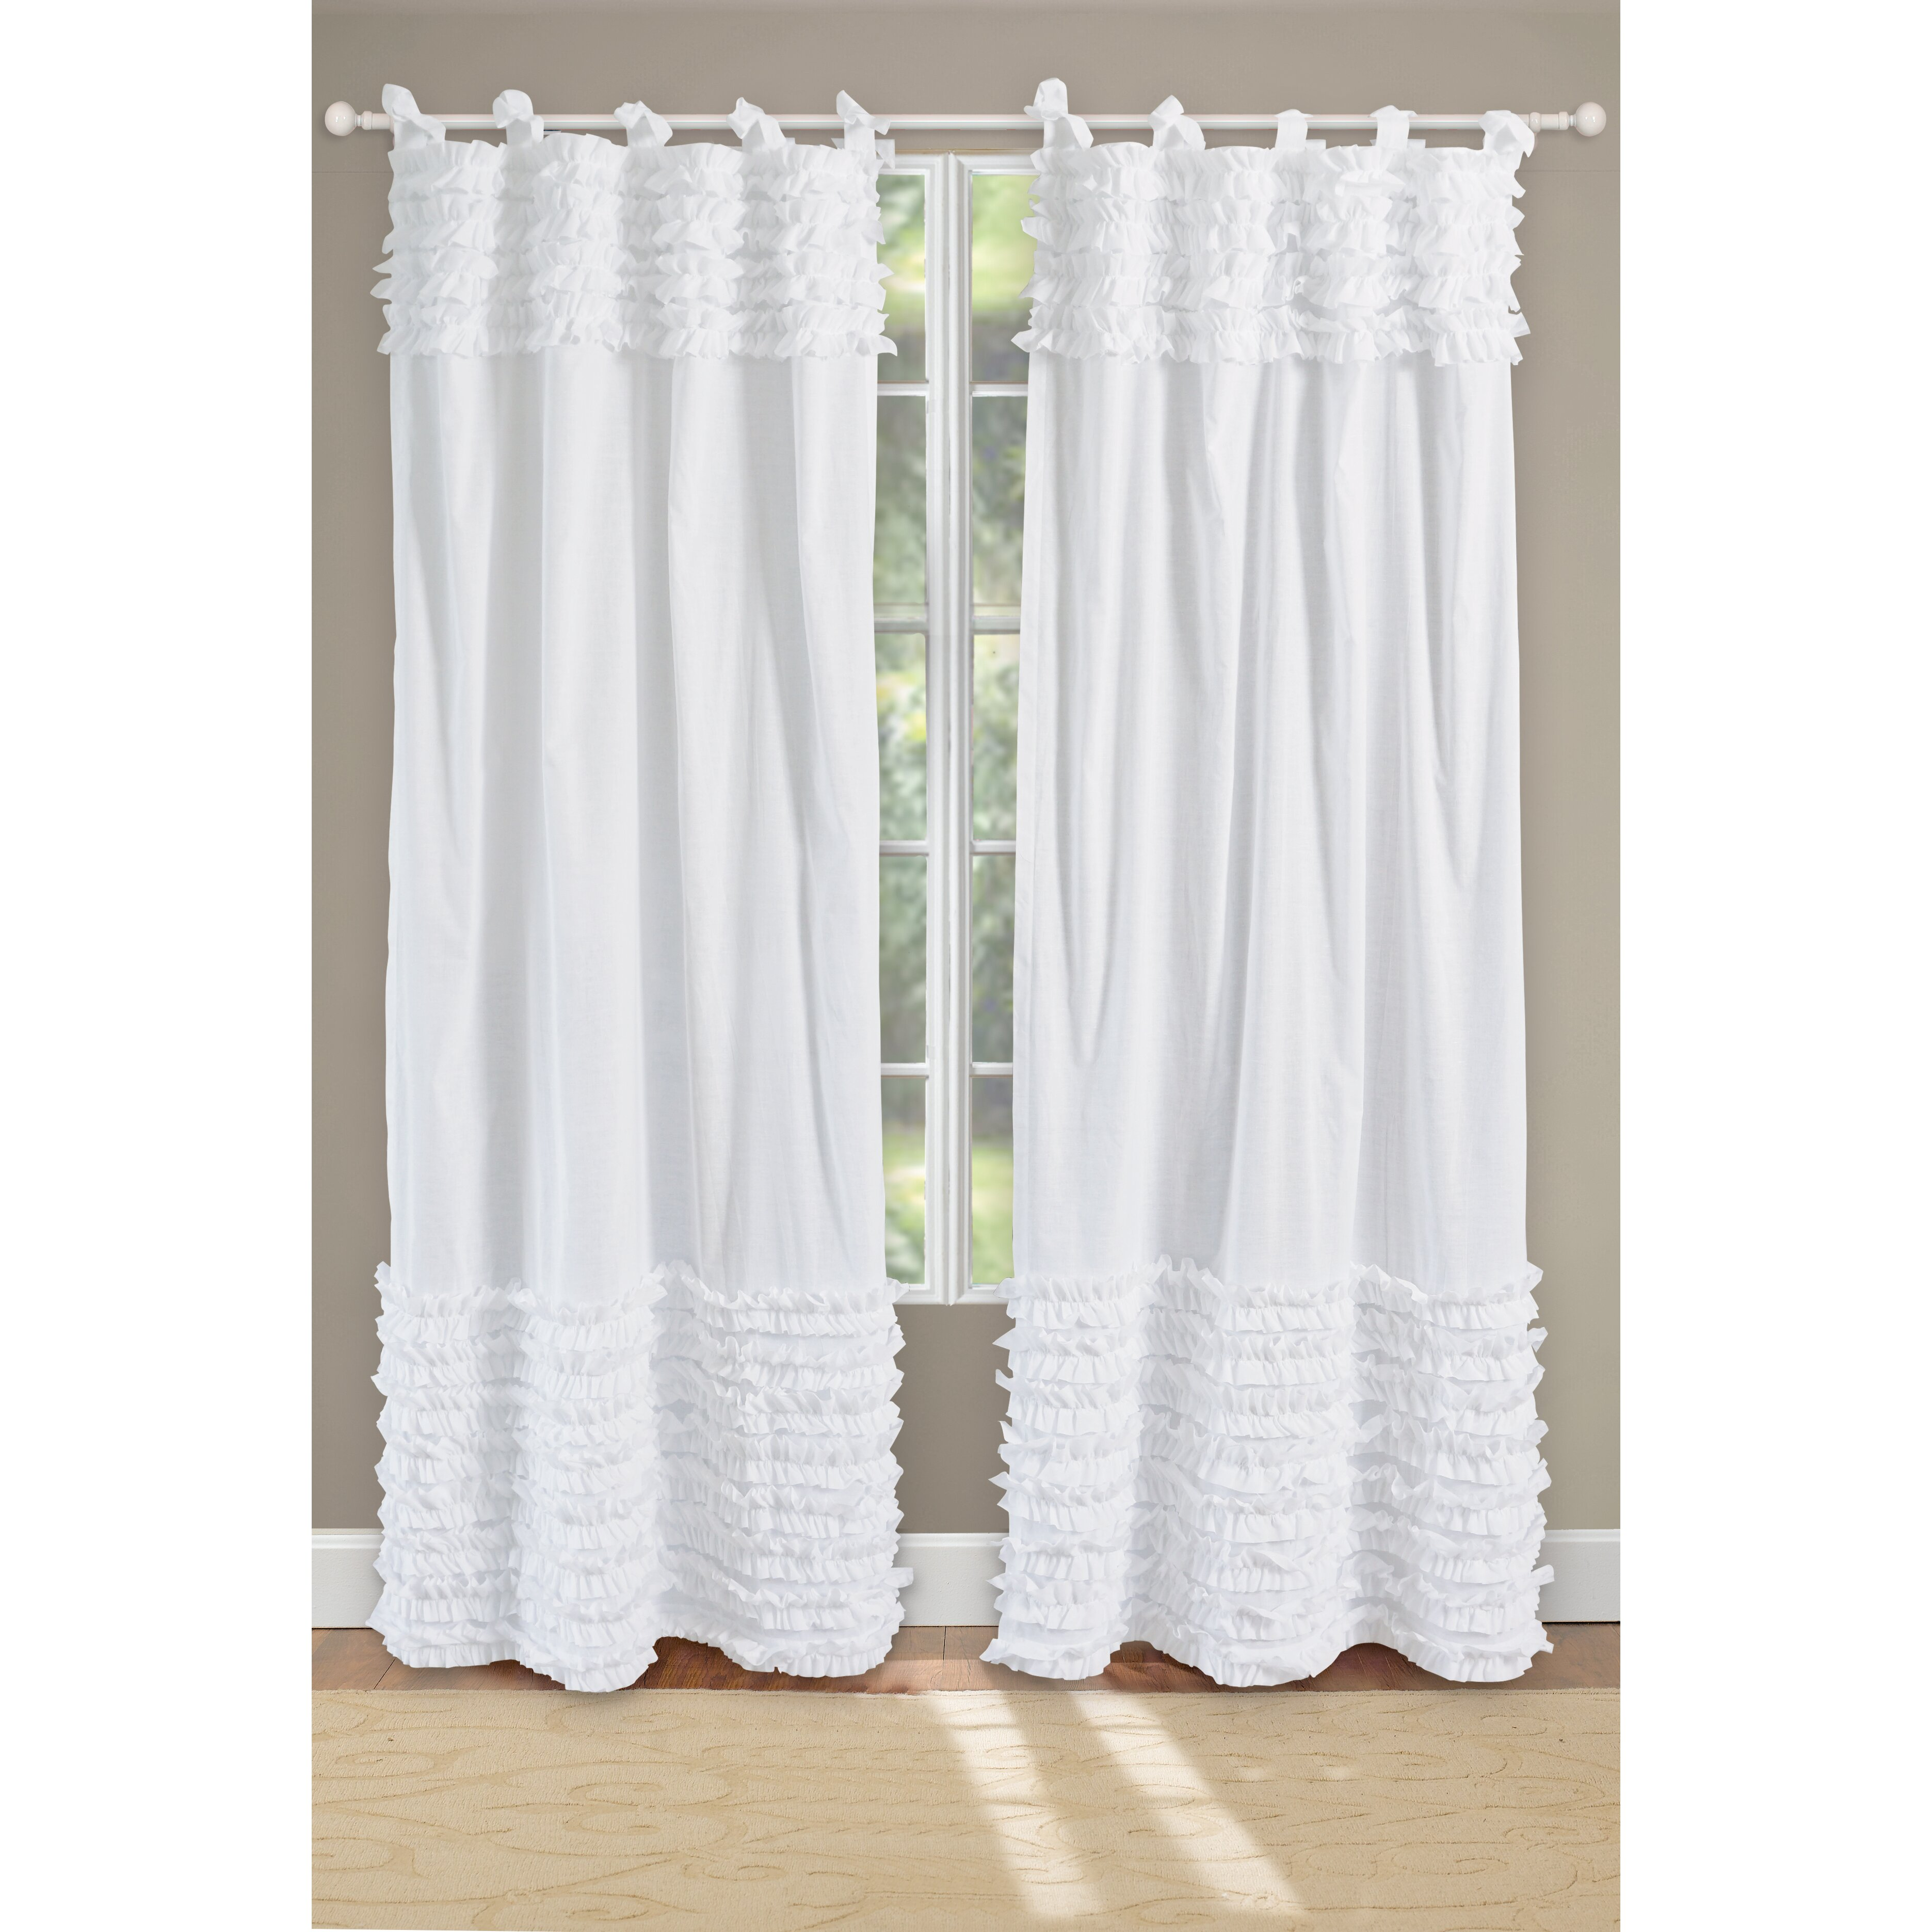 Greenland Home Fashions Lush Curtain Panels Reviews